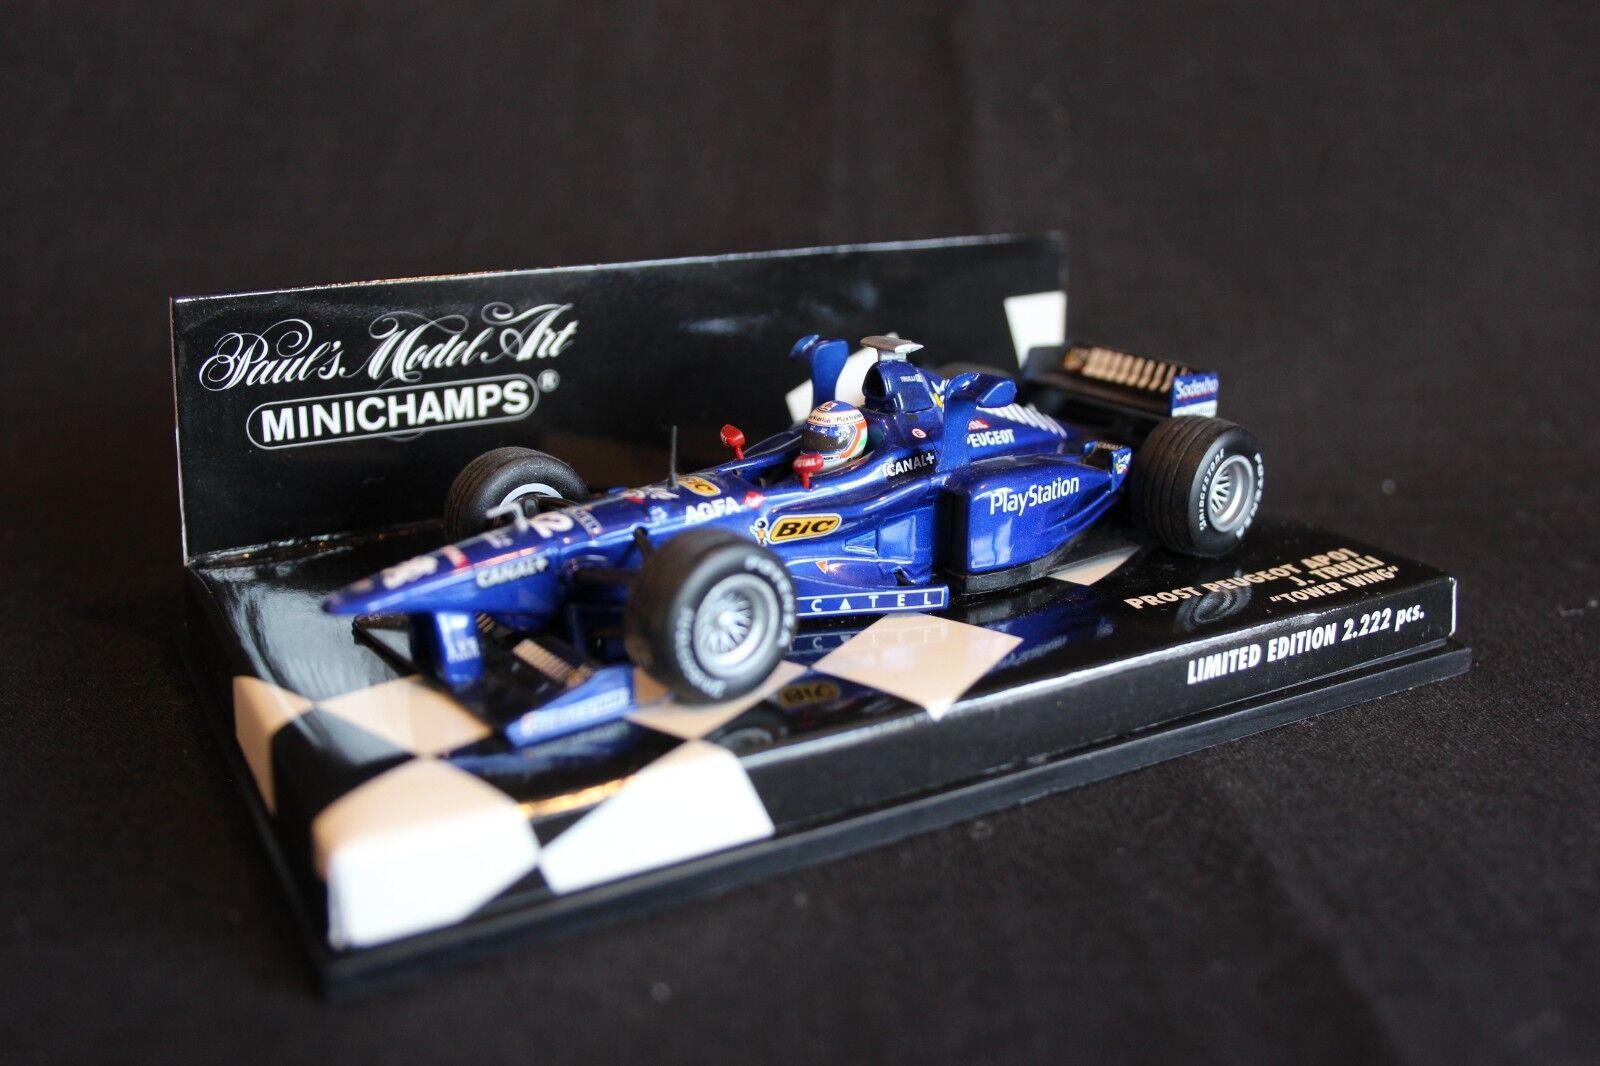 Minichamps Prost Peugeot AP01 1998 1:43 #12 Jarno Trulli (ITA)